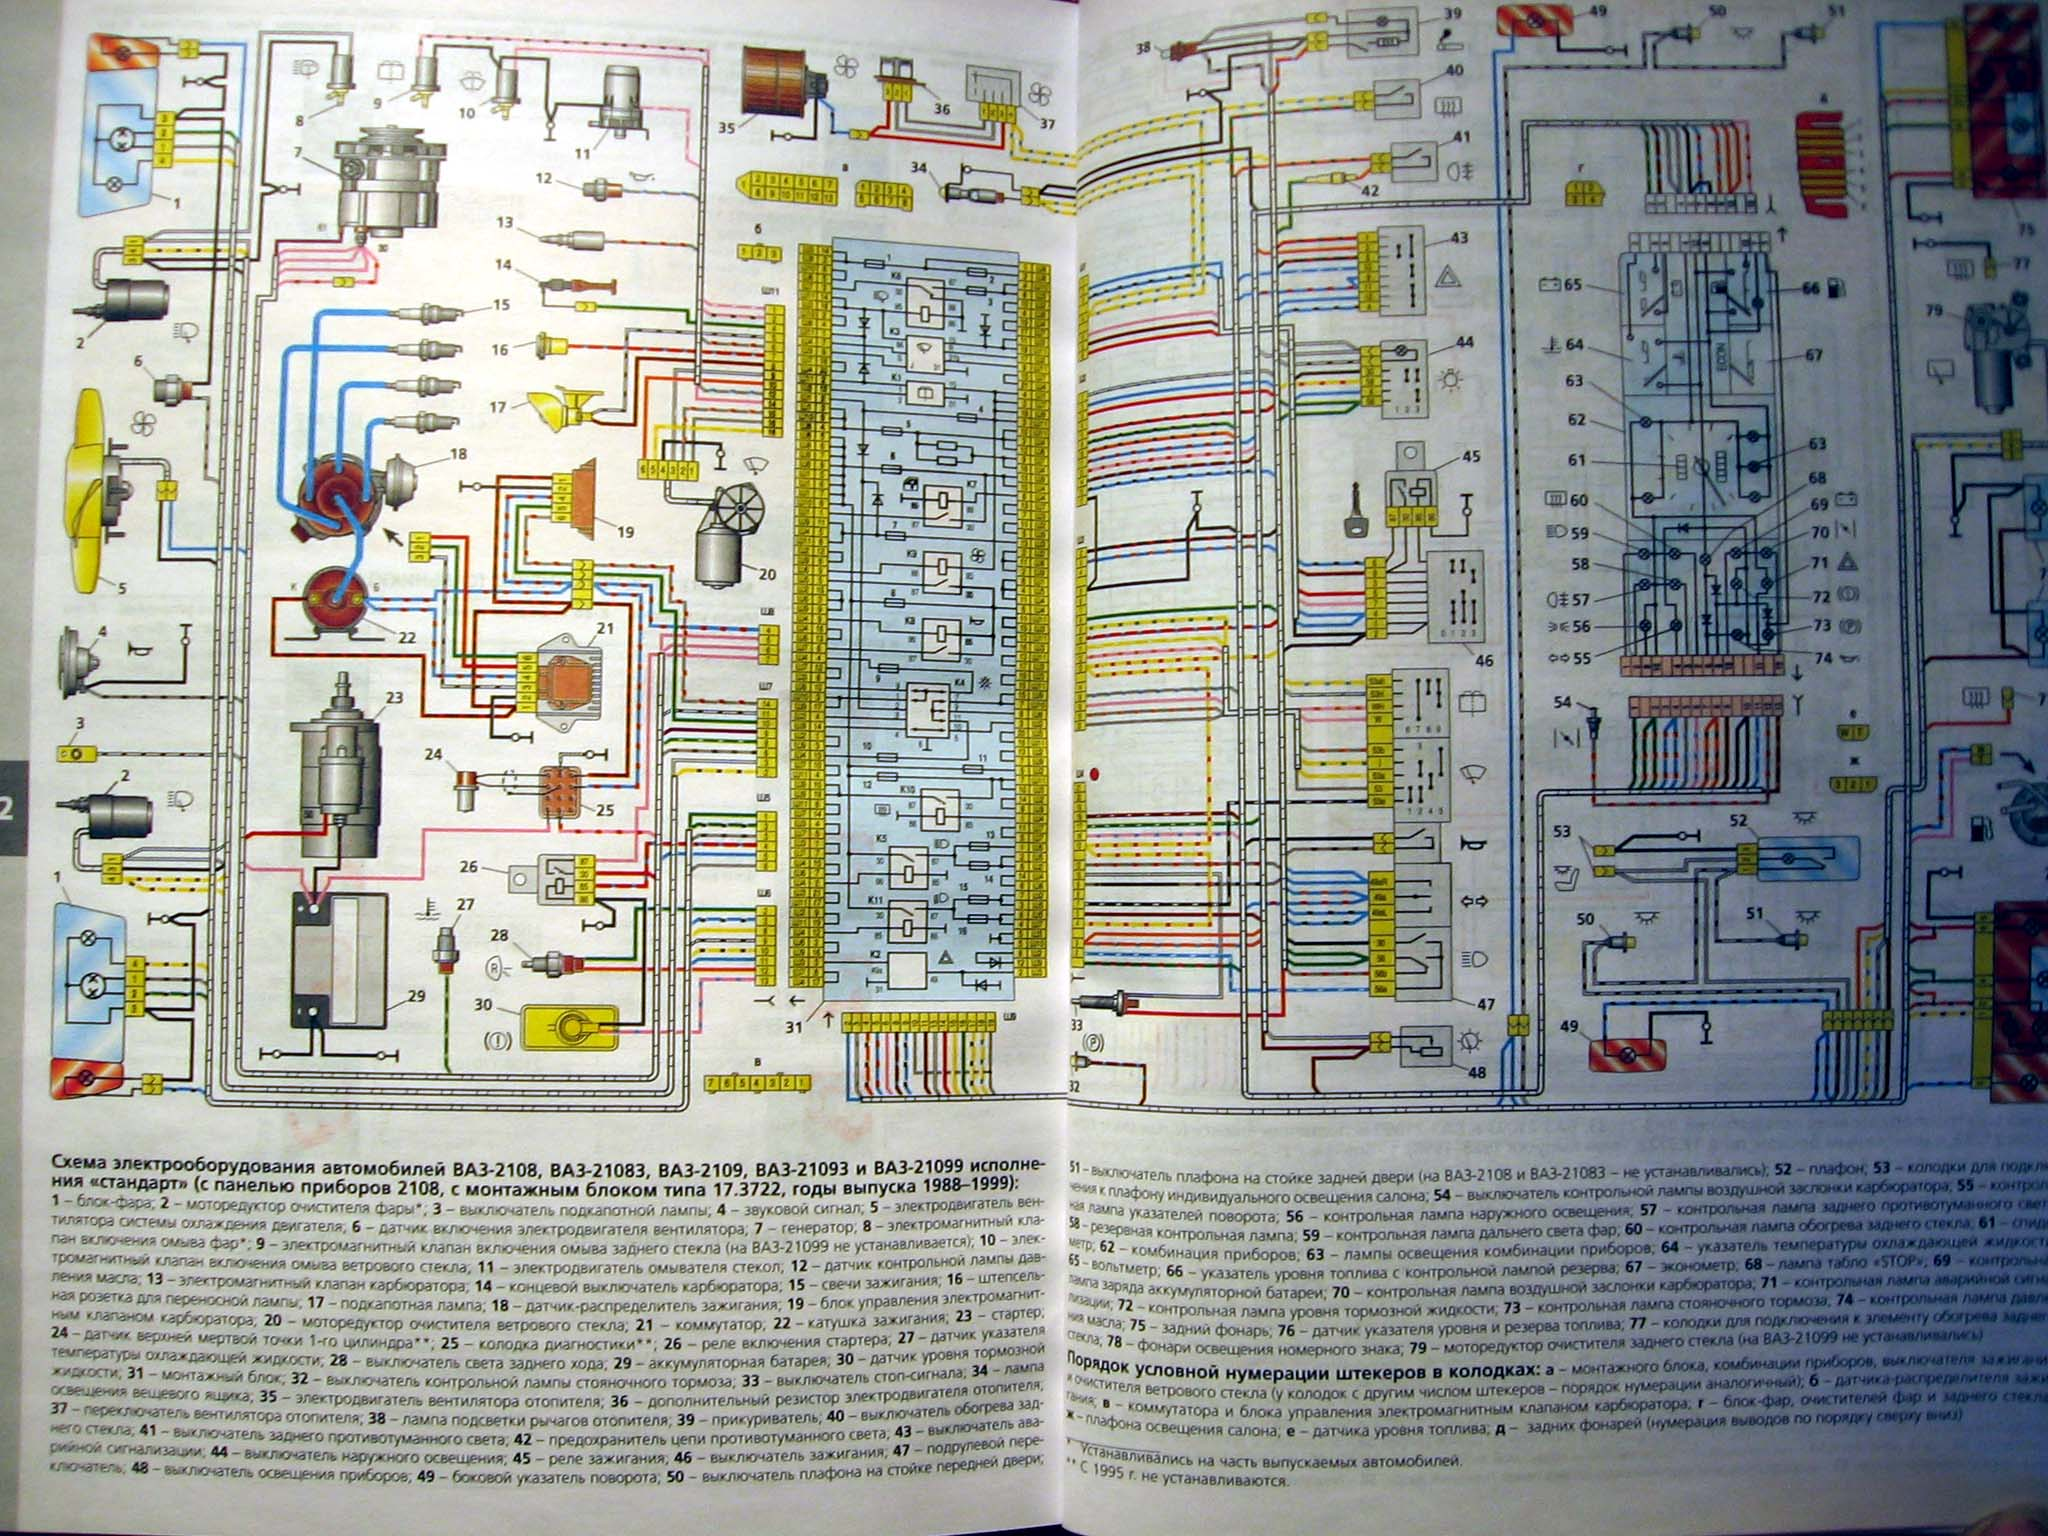 эл схема на ваз 21093 инжектор